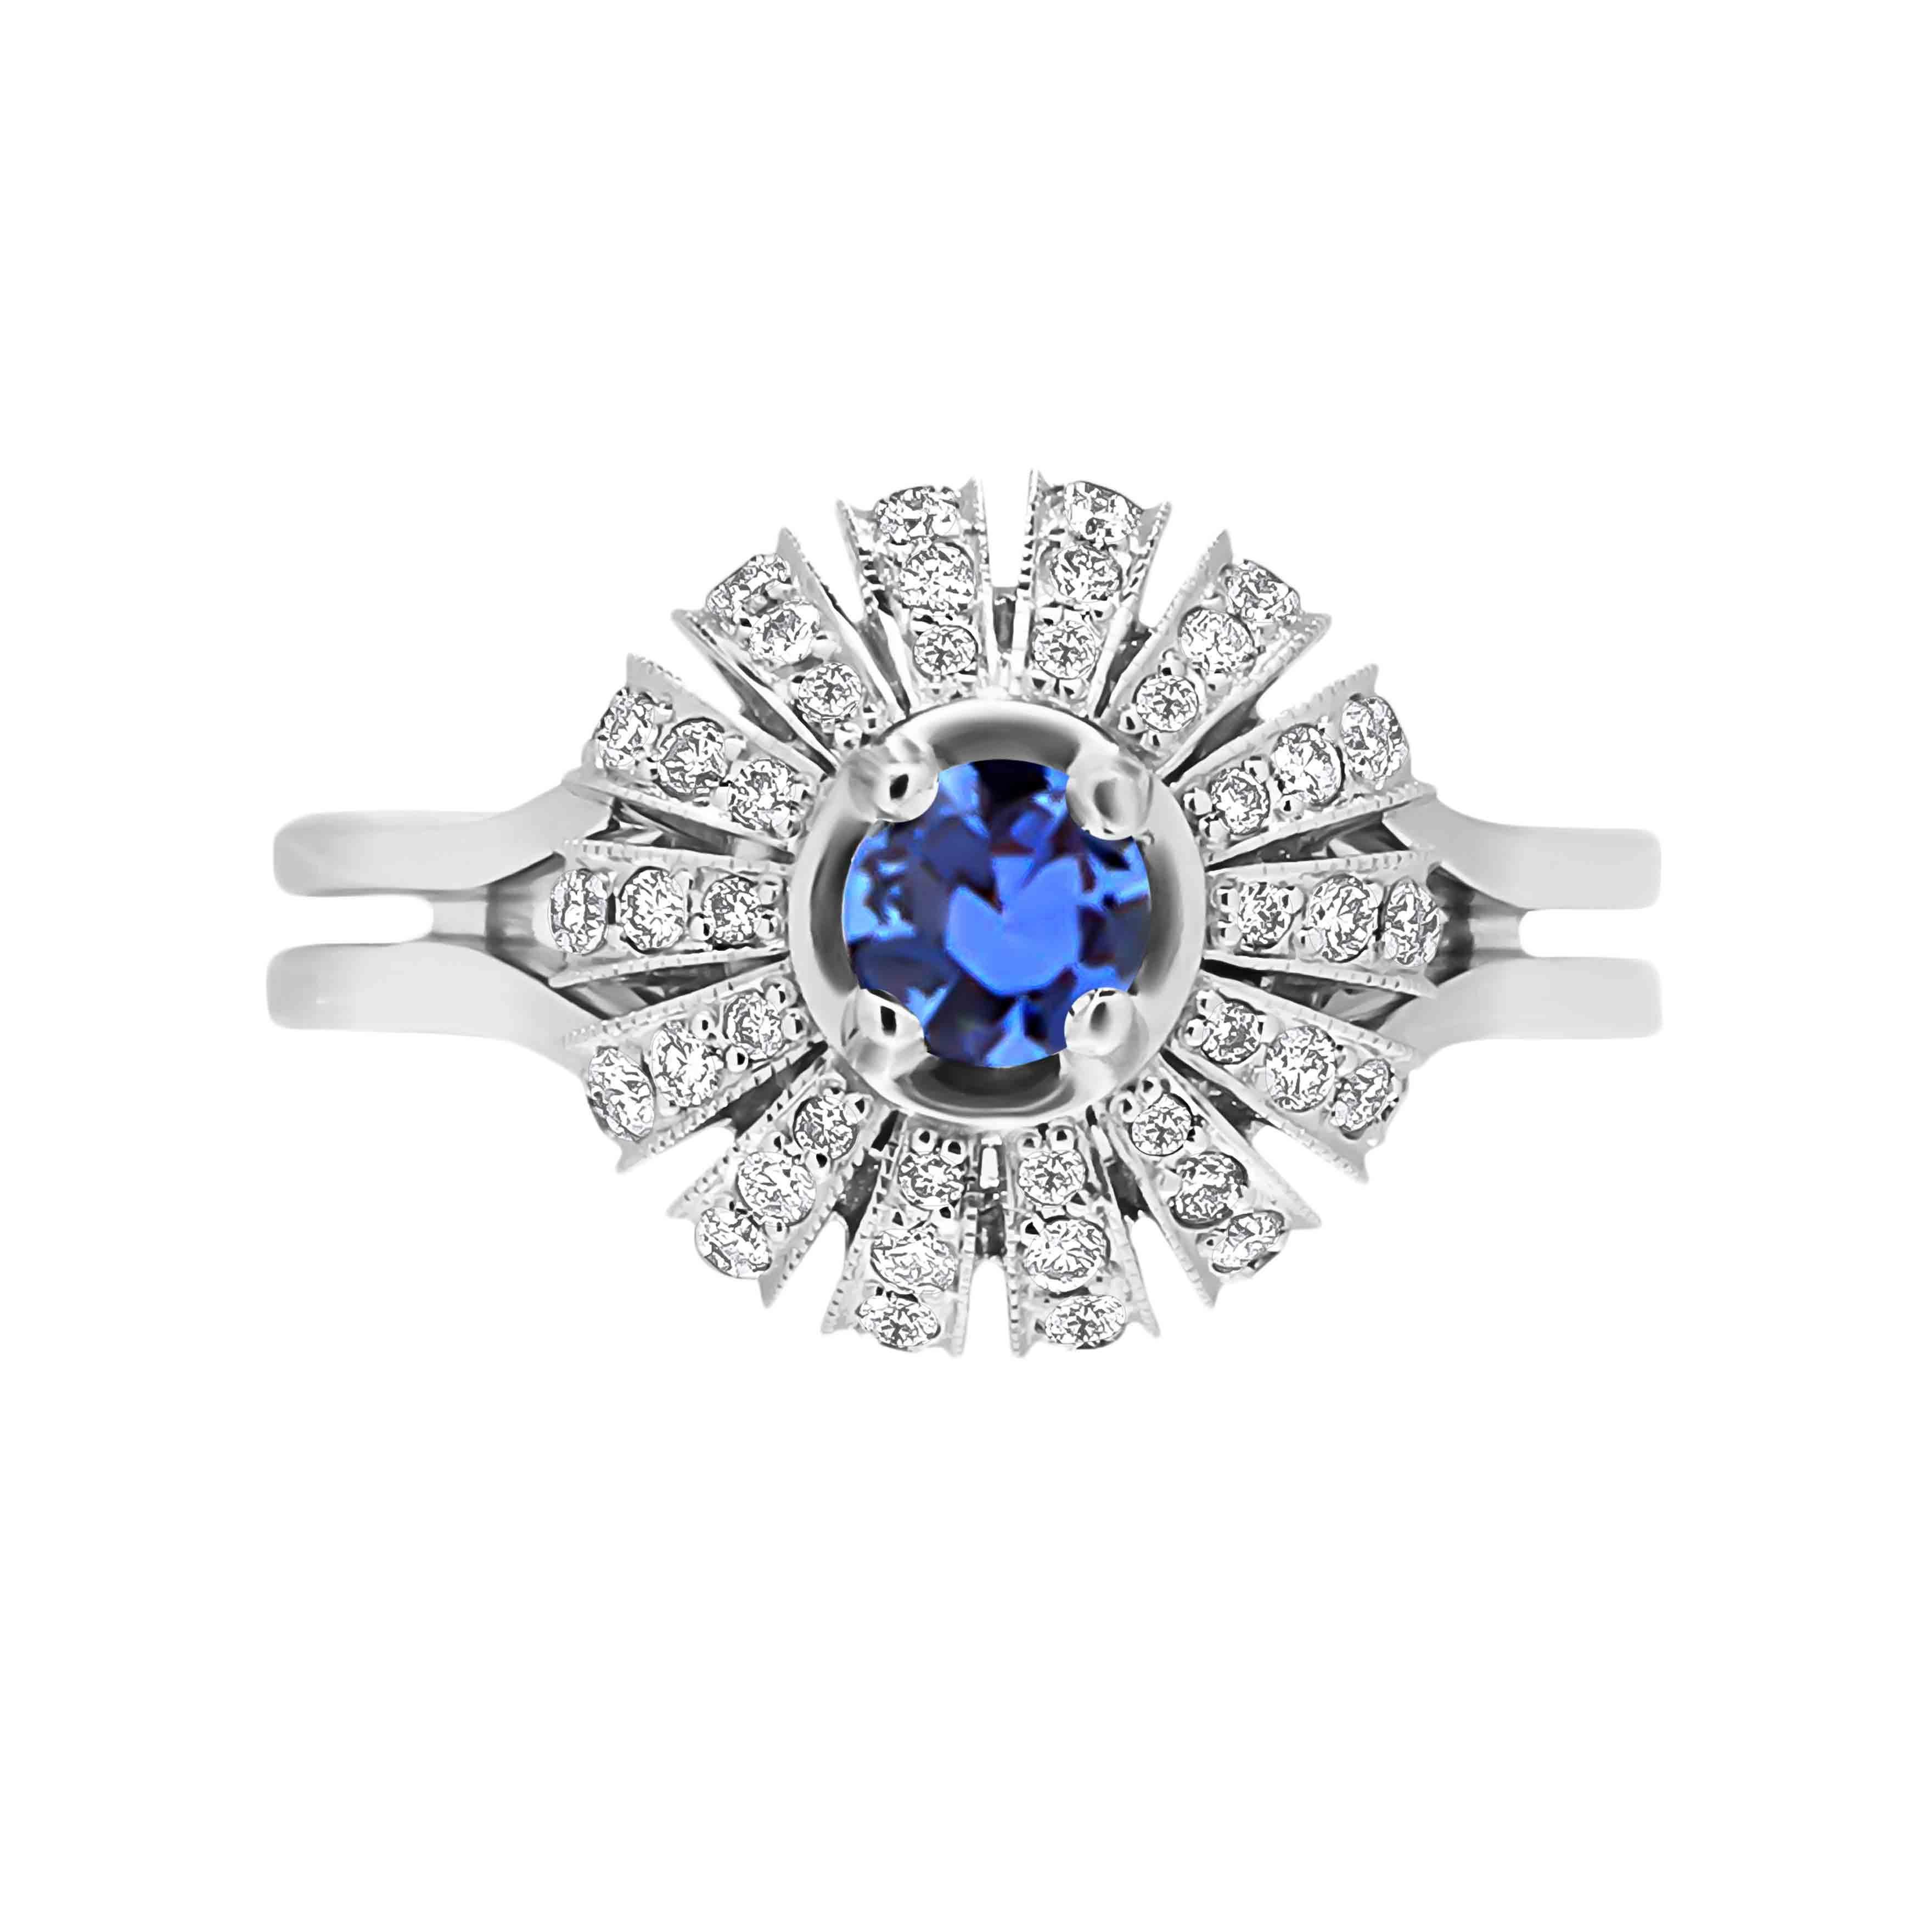 Estate Diamond Jewelry Cornflower Blue Sapphire Ring